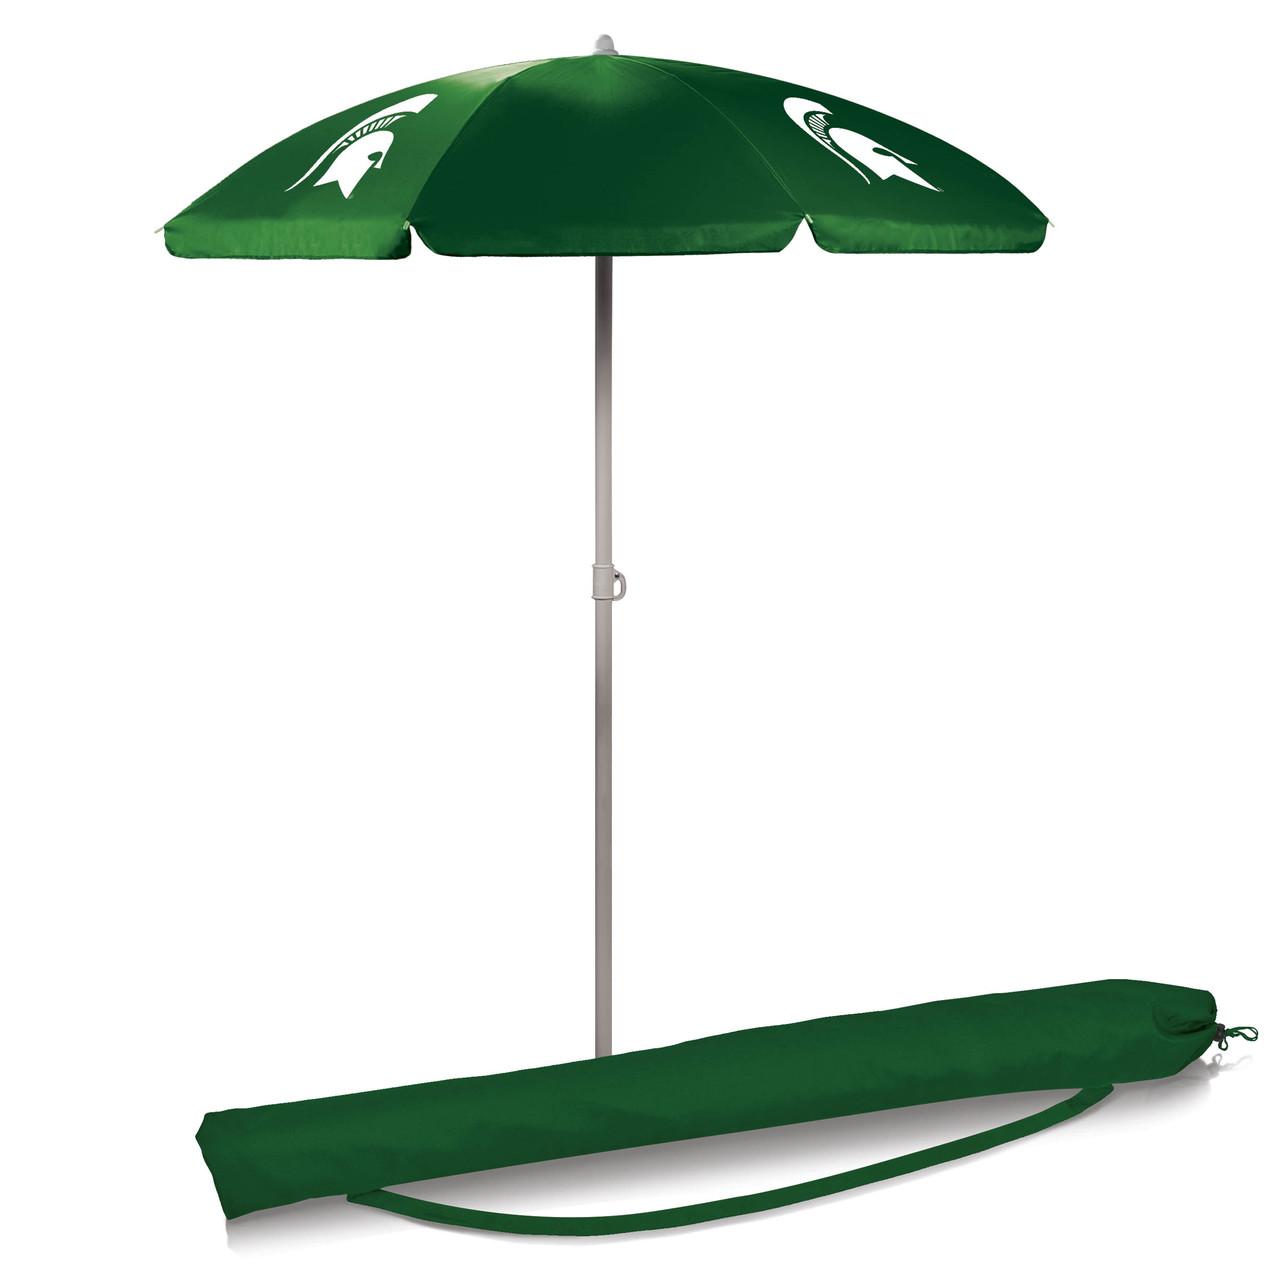 Umbrella - Michigan state